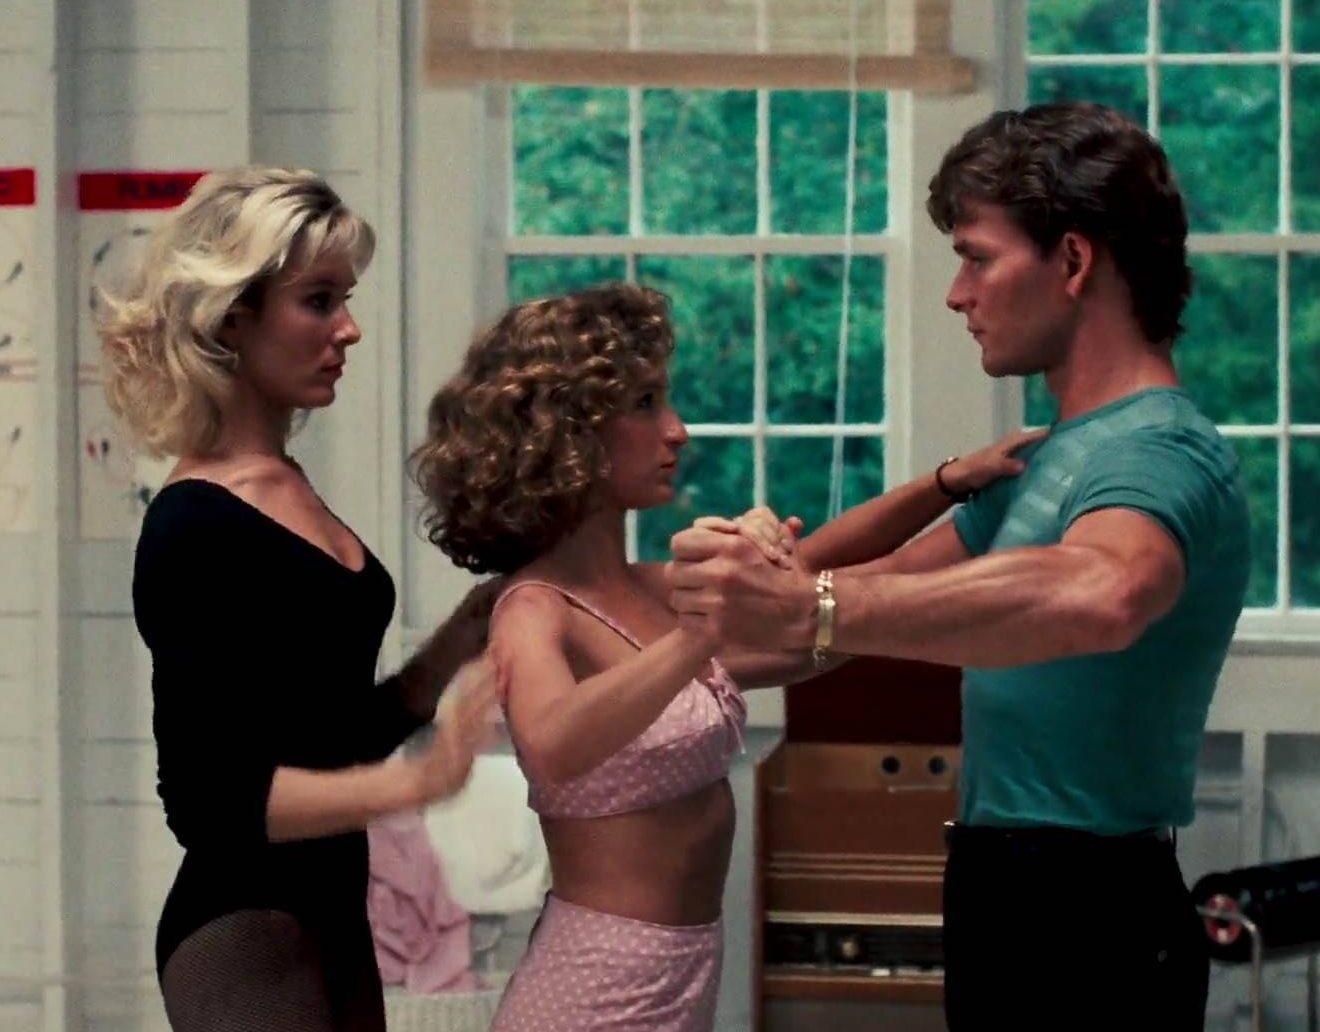 MV5BZWU5NWRkNzQtZTQzYi00MTllLWE1MDUtODA5ZTc0MzhhMmU3XkEyXkFqcGdeQXVyOTc5MDI5NjE@. V1 e1617269407529 30 Things You Probably Didn't Know About Dirty Dancing